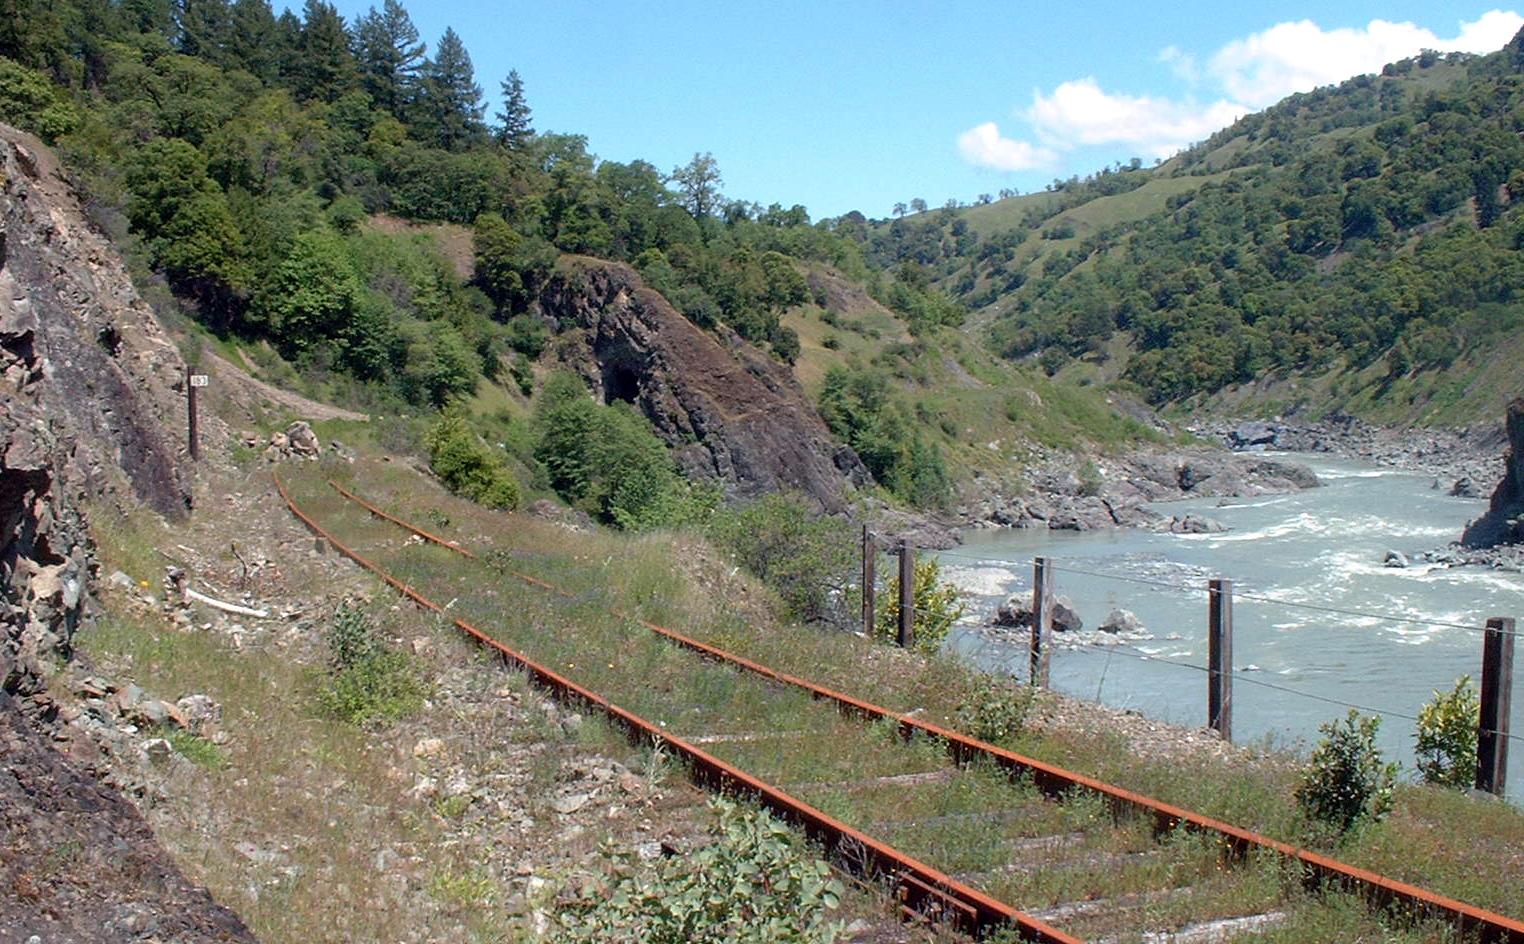 Abandoned rail line alongside mainstem Eel River.